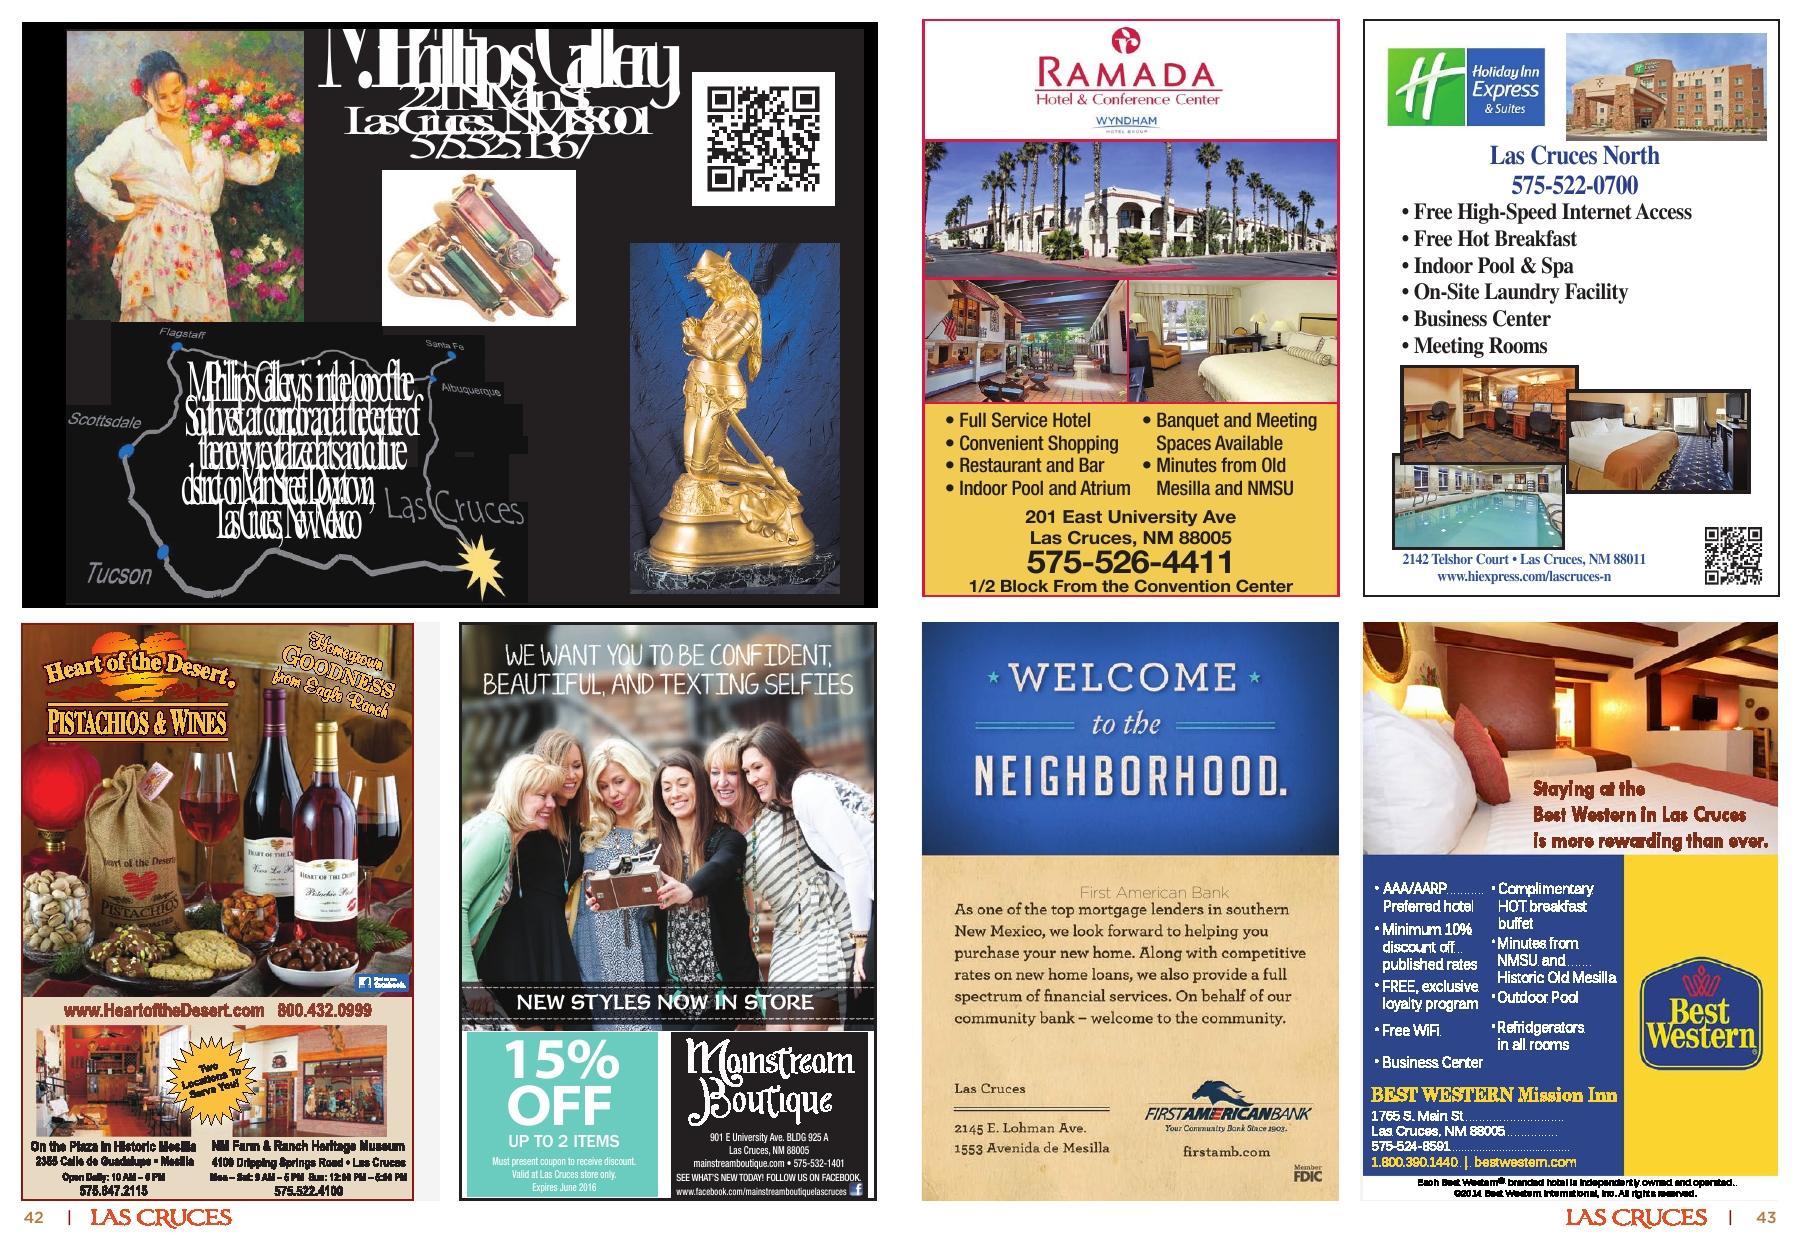 LC Visitors Guide 2015